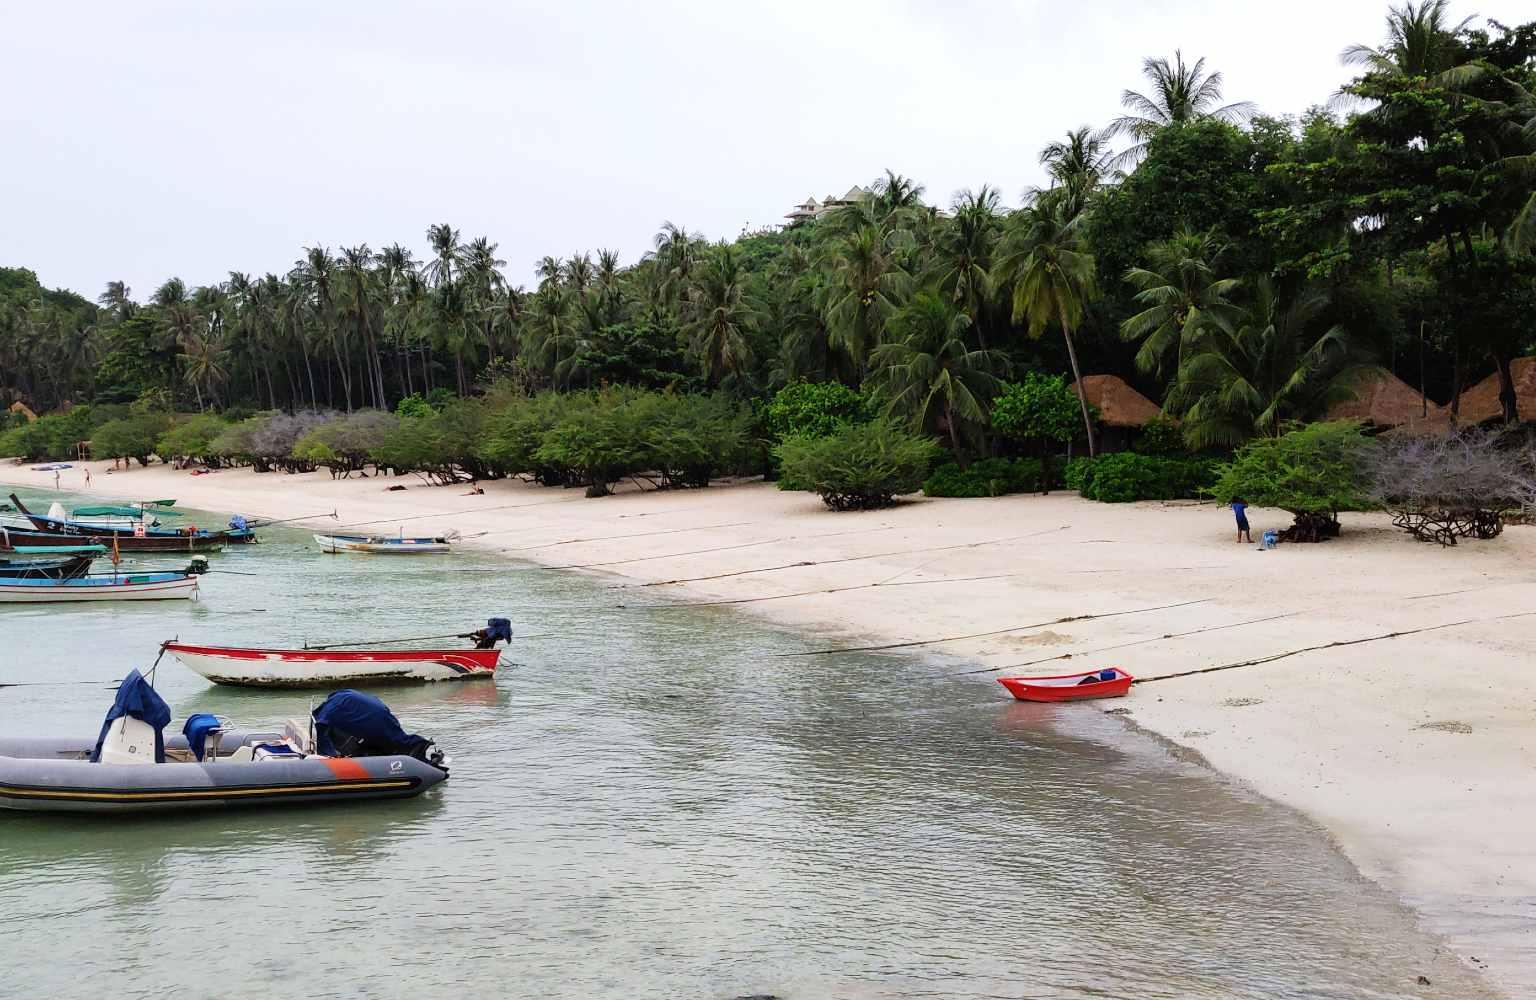 De baai van Shark Bay (Thian Og Bay) op Koh Tao, Thailand